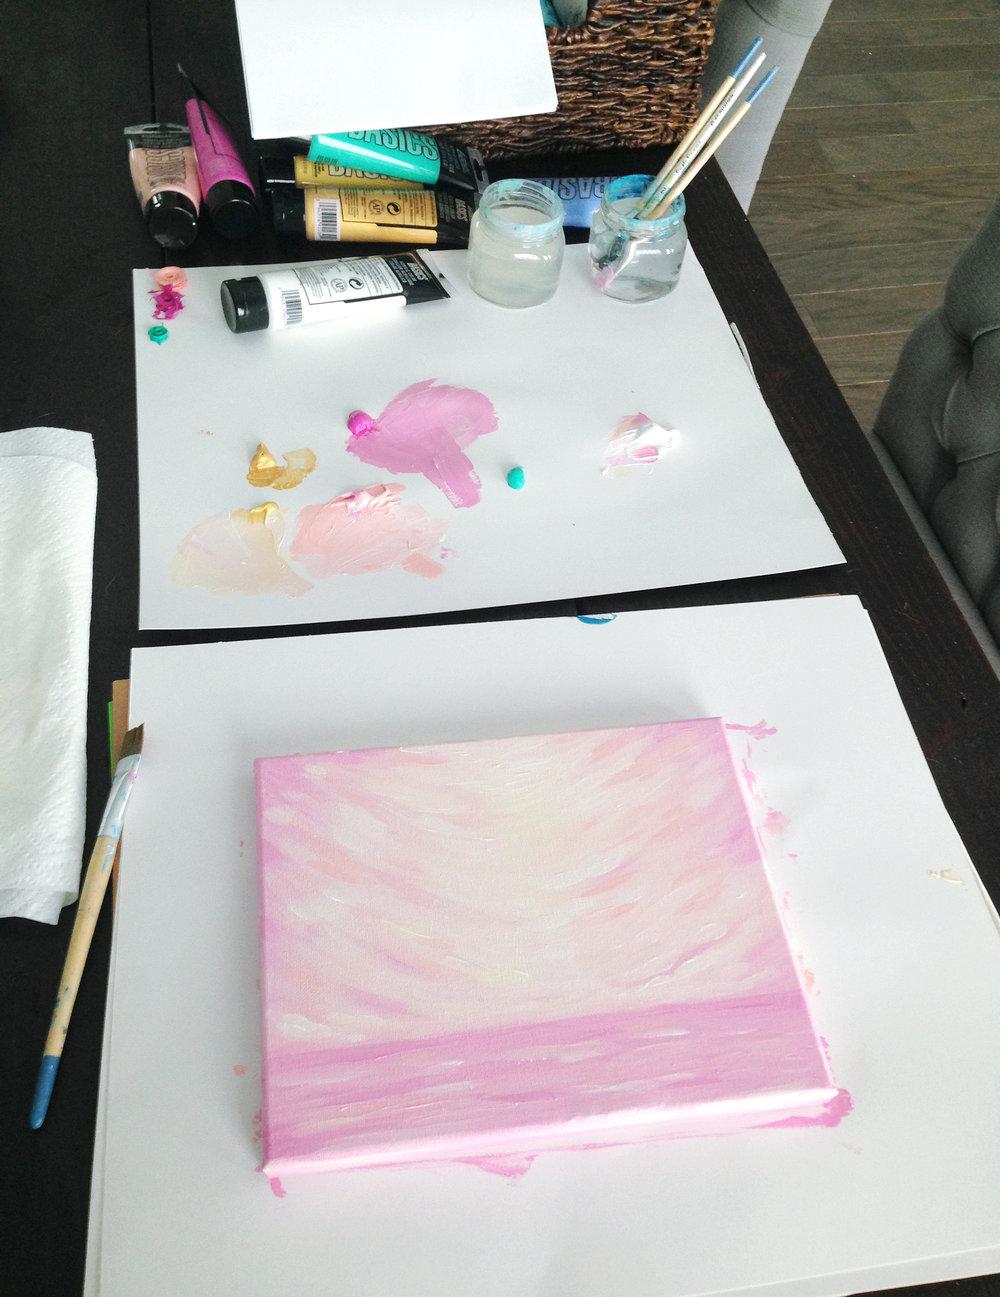 Kristen Laczi Golden Hour Acrylic Painting Work in Progress